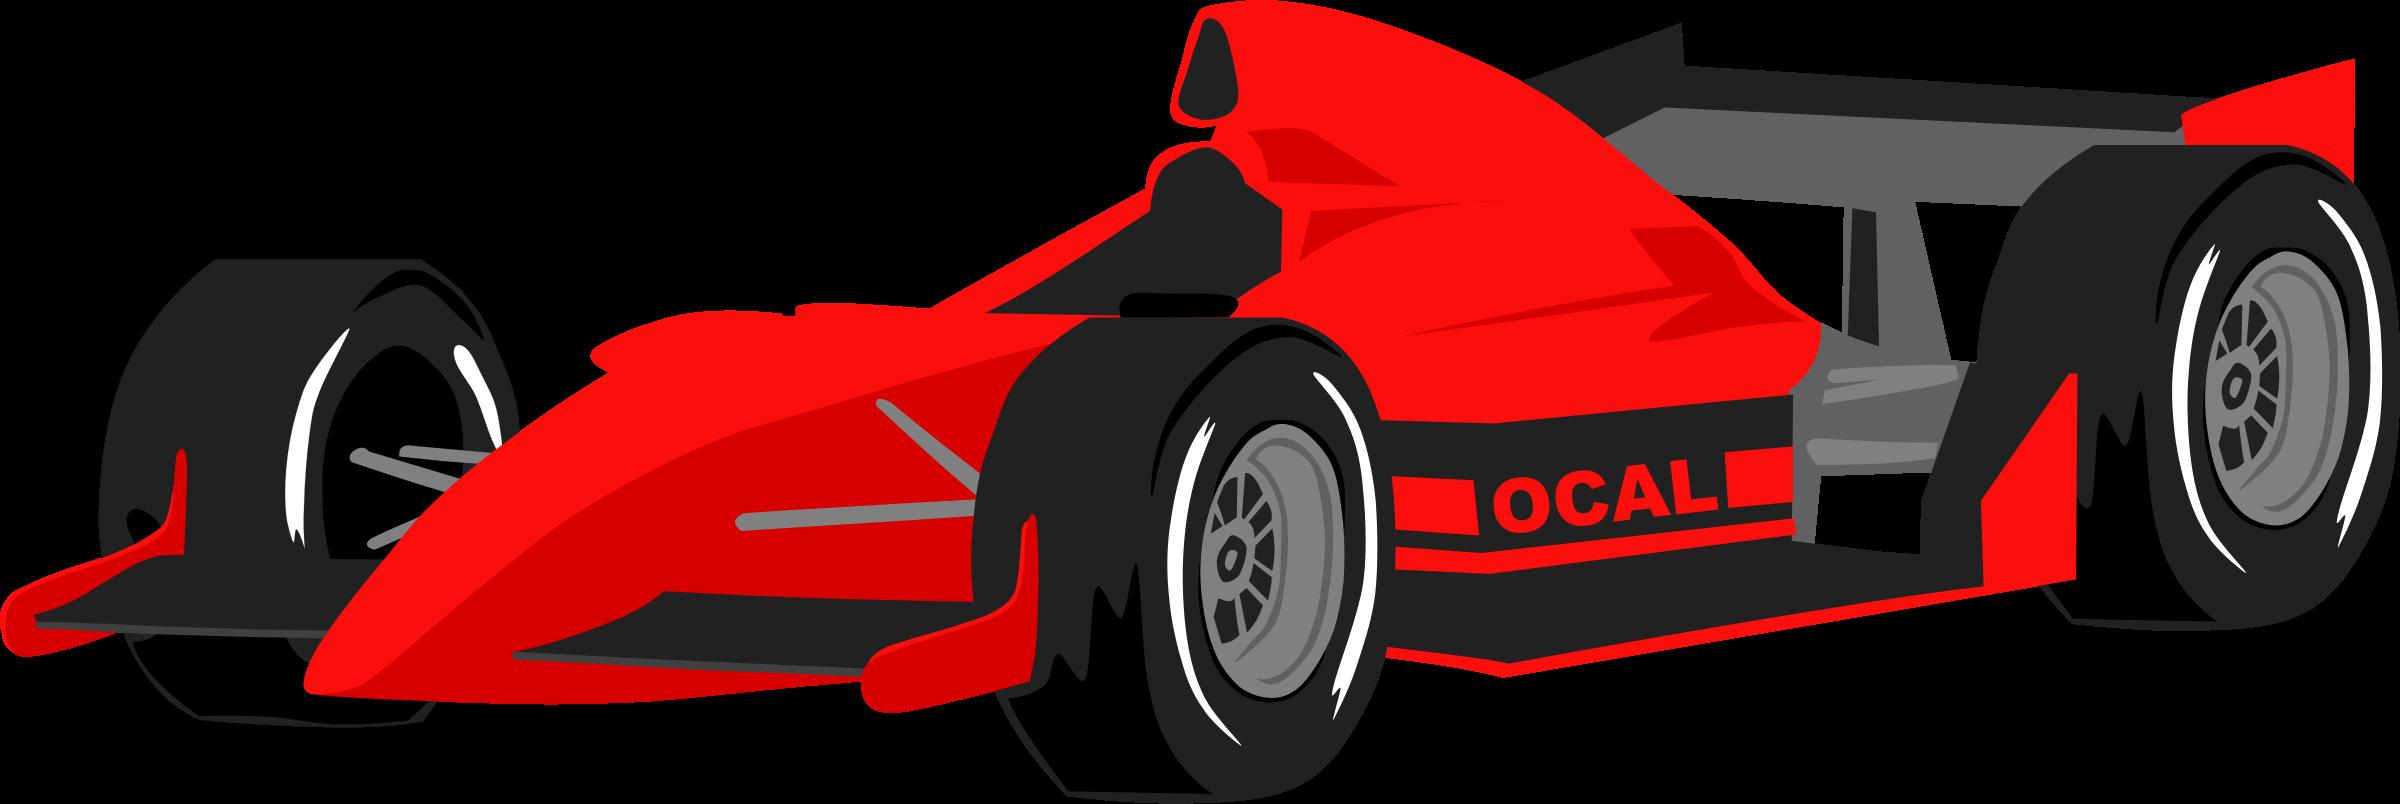 Animated Race Cars.